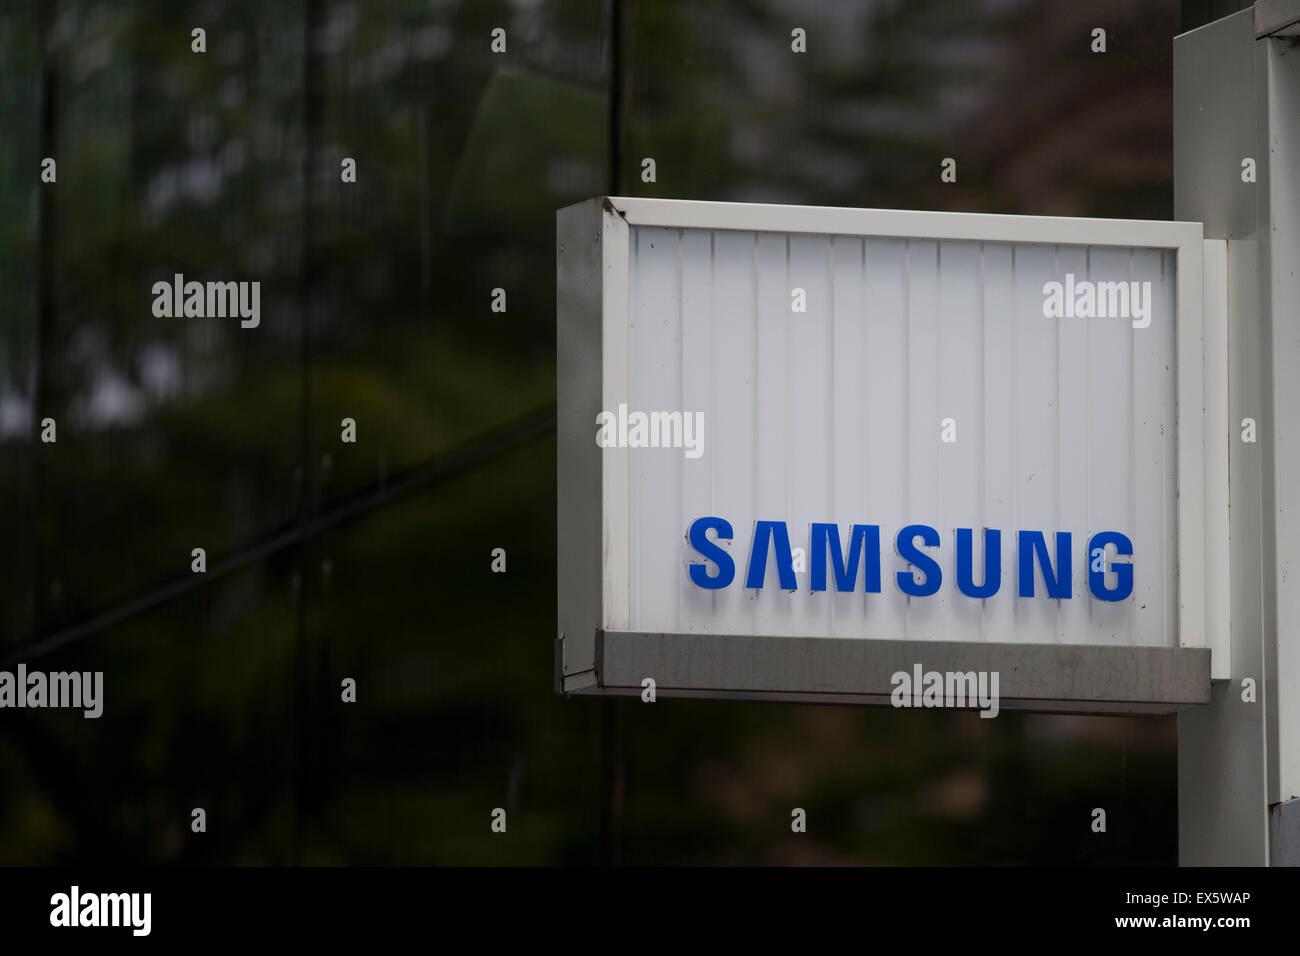 A Samsung shop sign logo. - Stock Image